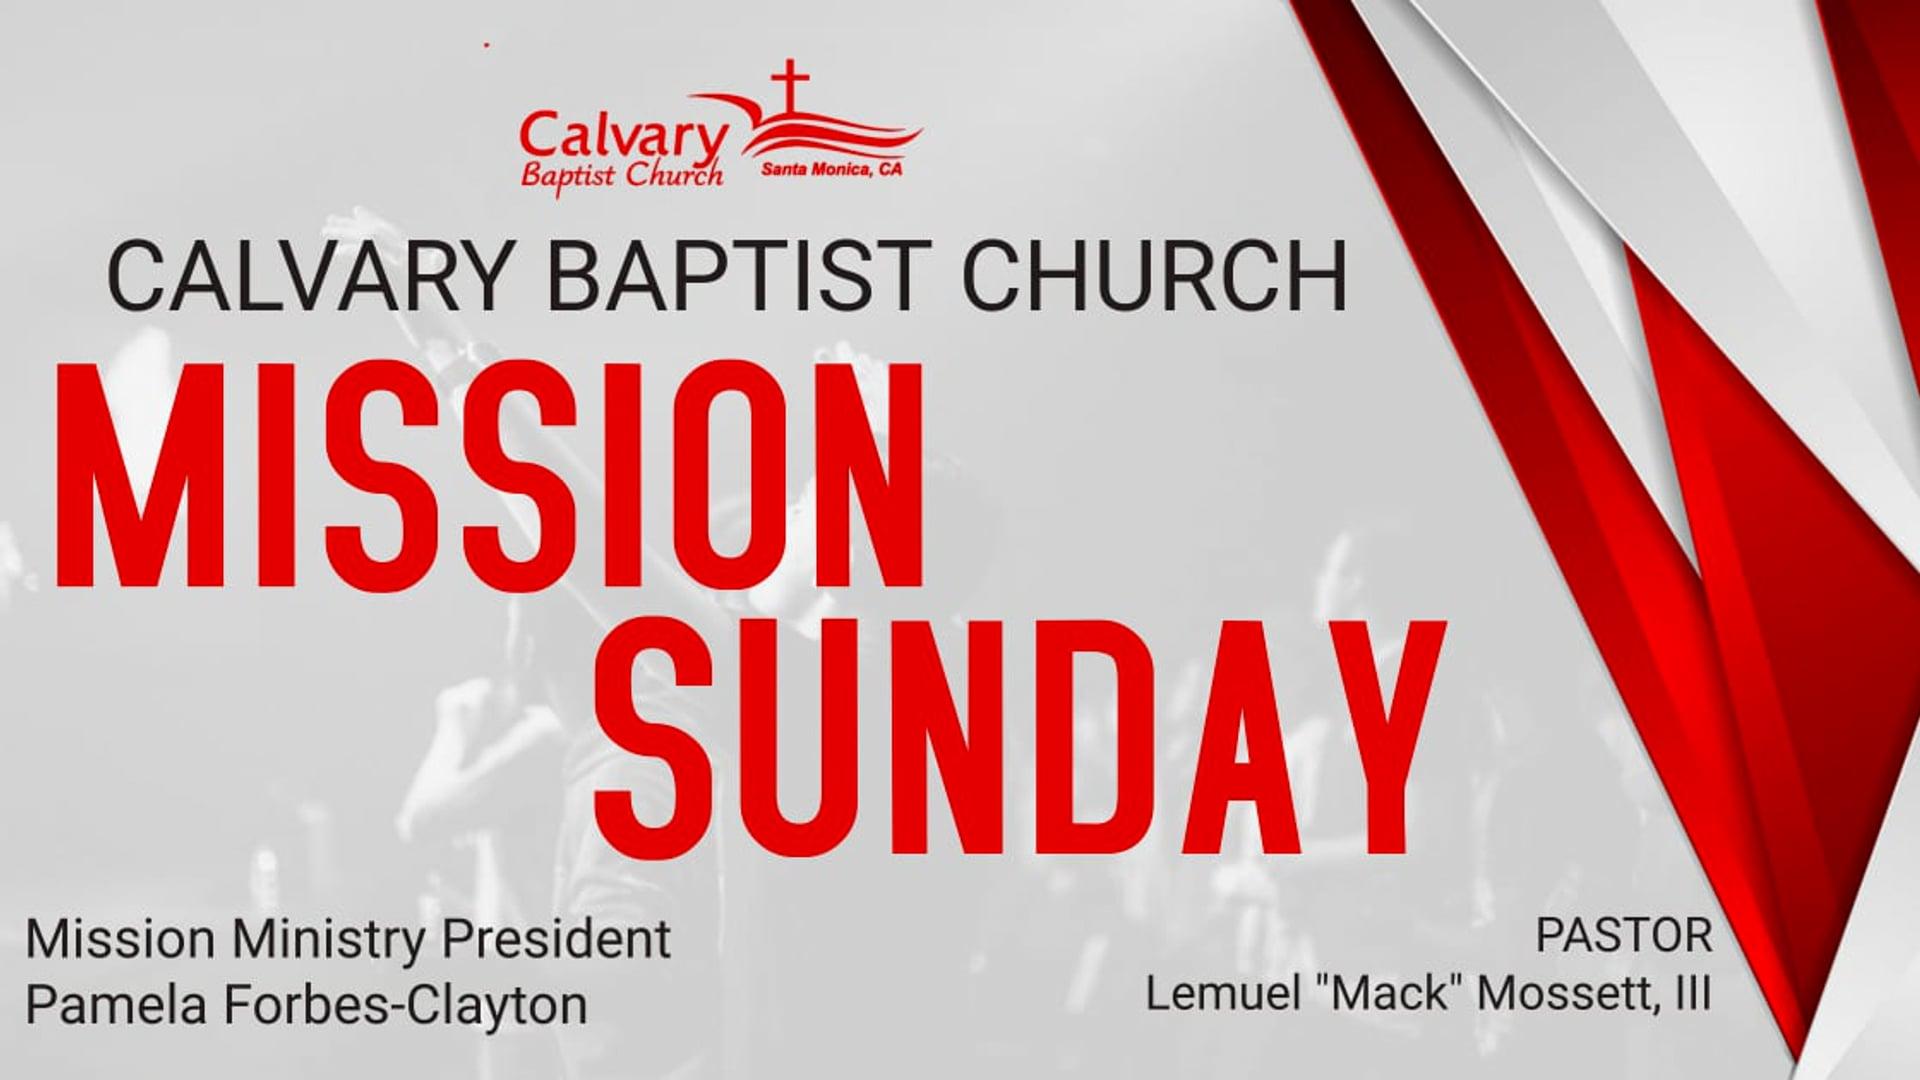 08.29.21 Calvary Baptist Church Worship Service